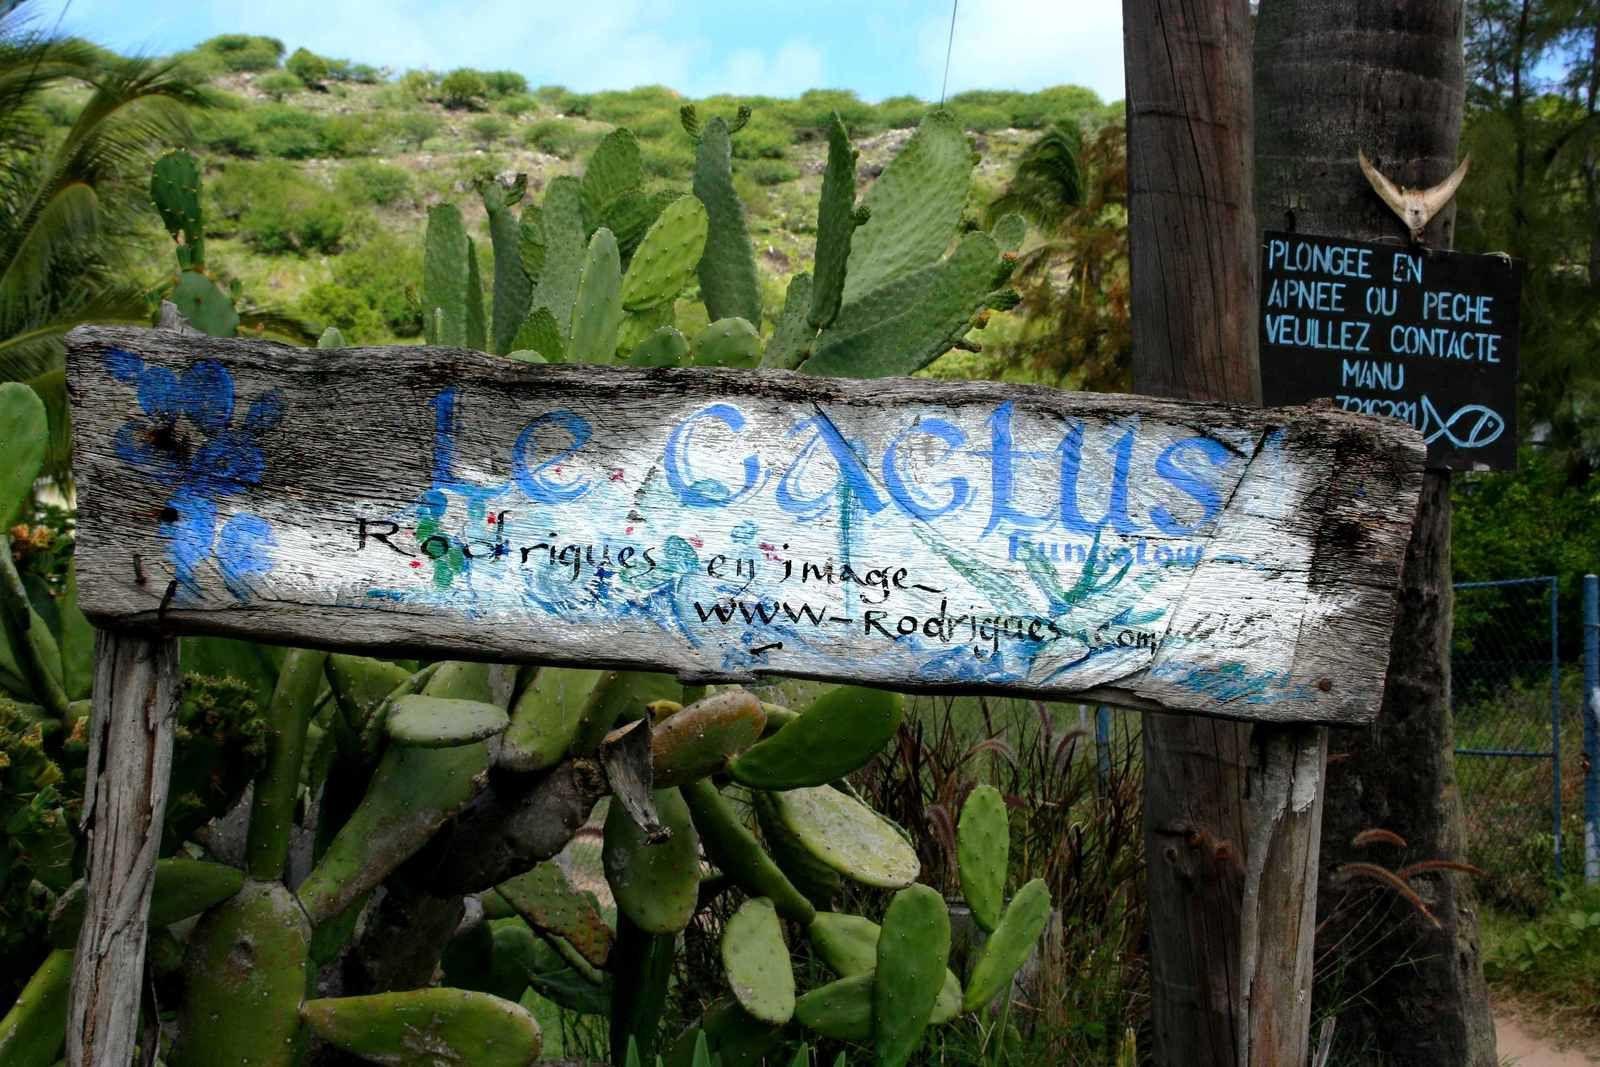 """Catégorie"" : L'île Rodrigues,  Océan Indien, Port-Mathurin, mars 2013, photos by GeoMar 215.exe"